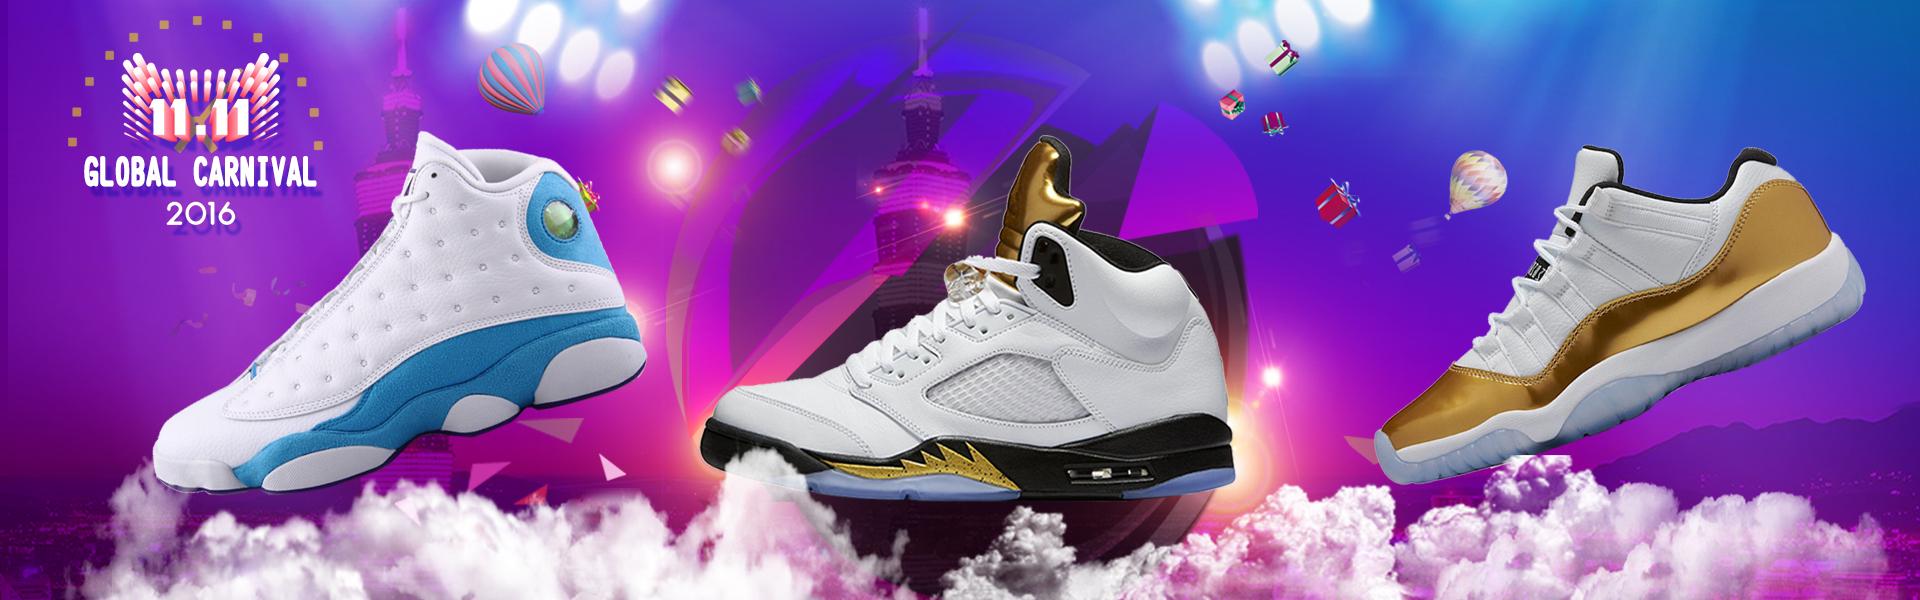 806617c7034e Basketball shoes running shoesPorair retro 11